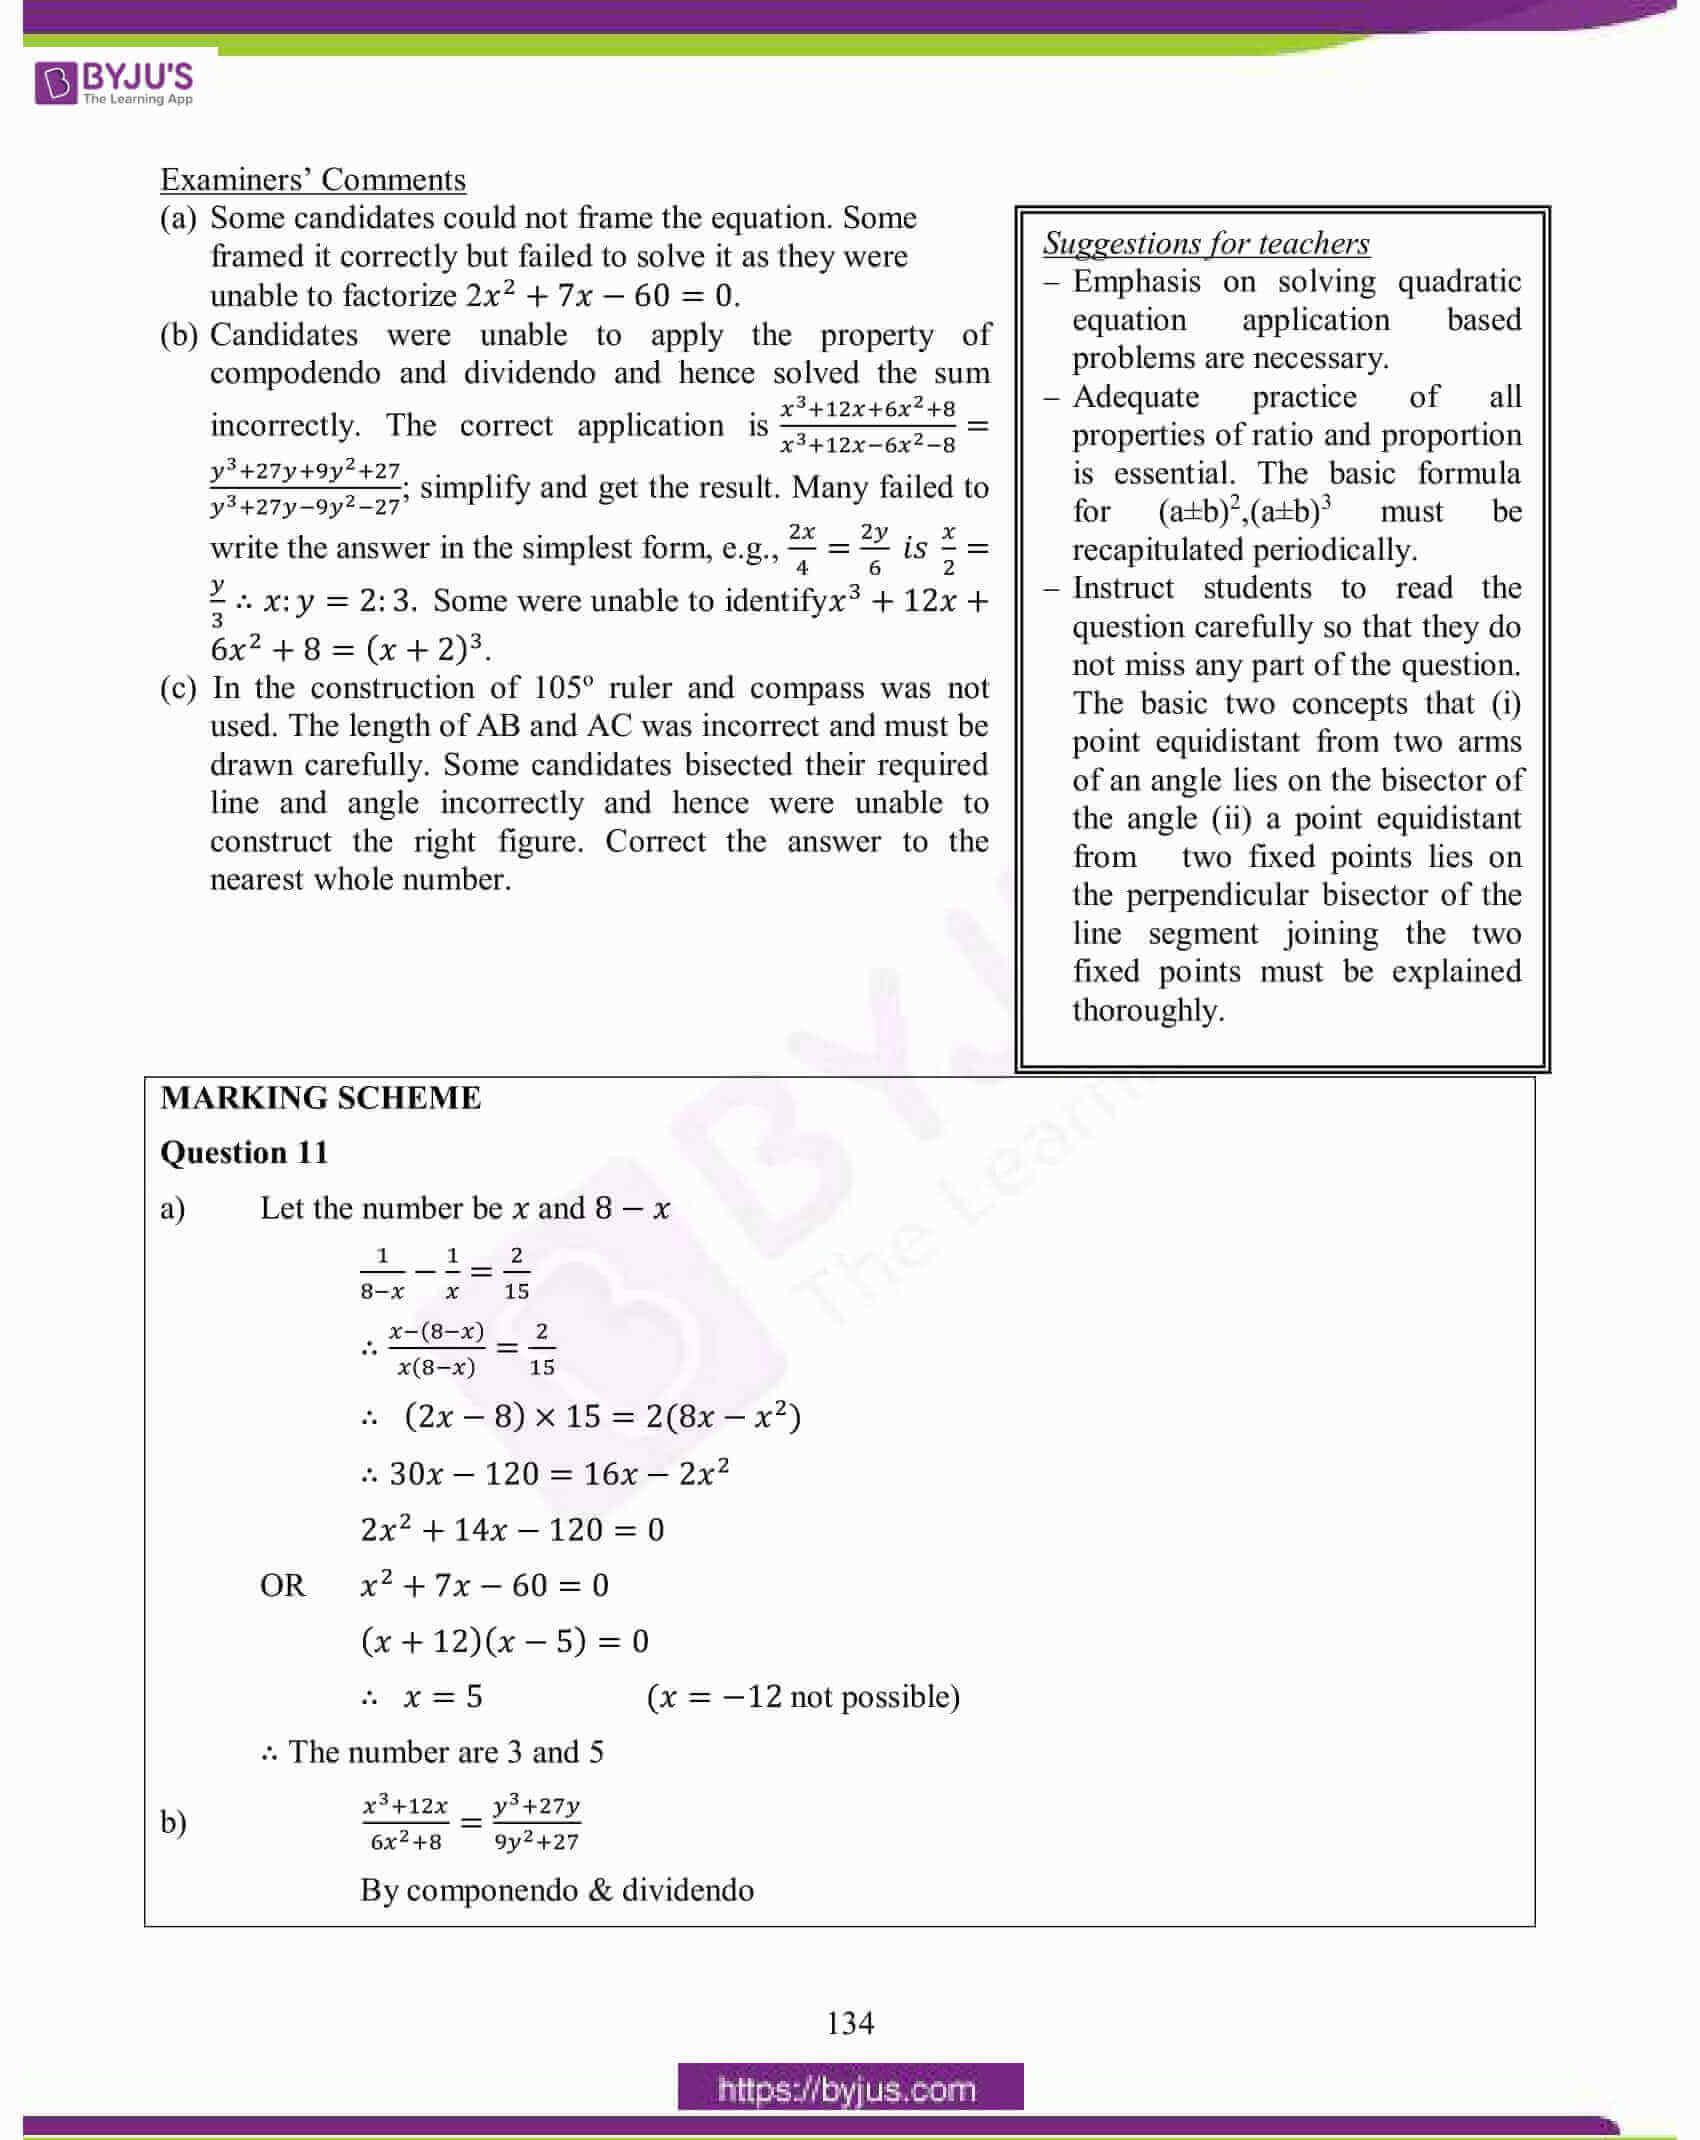 icse class 10 maths question paper solution 2015 22